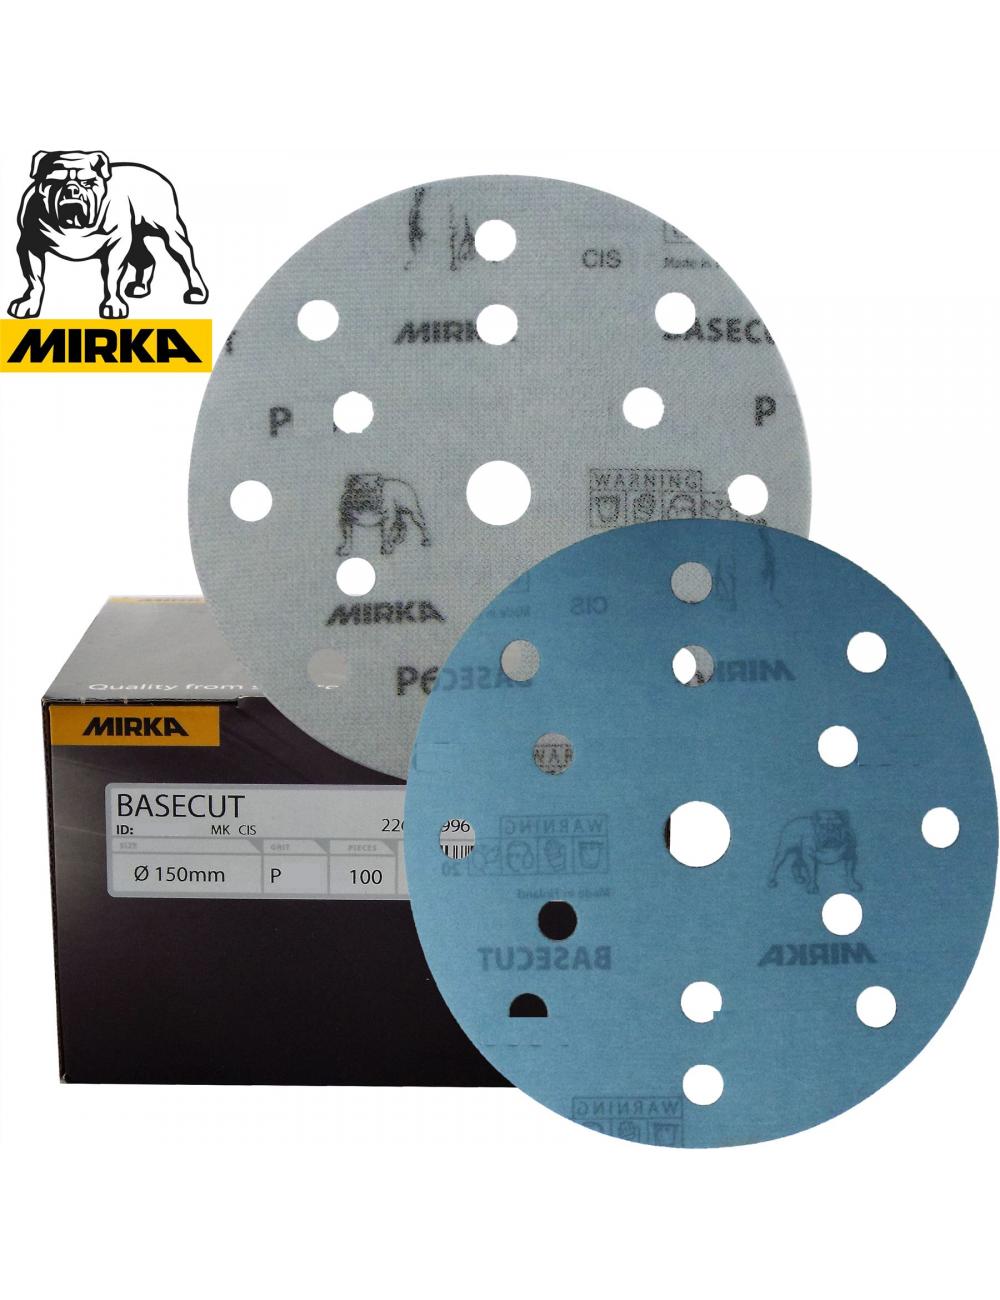 100 disques BASECUT 150mm 15T Grip P600